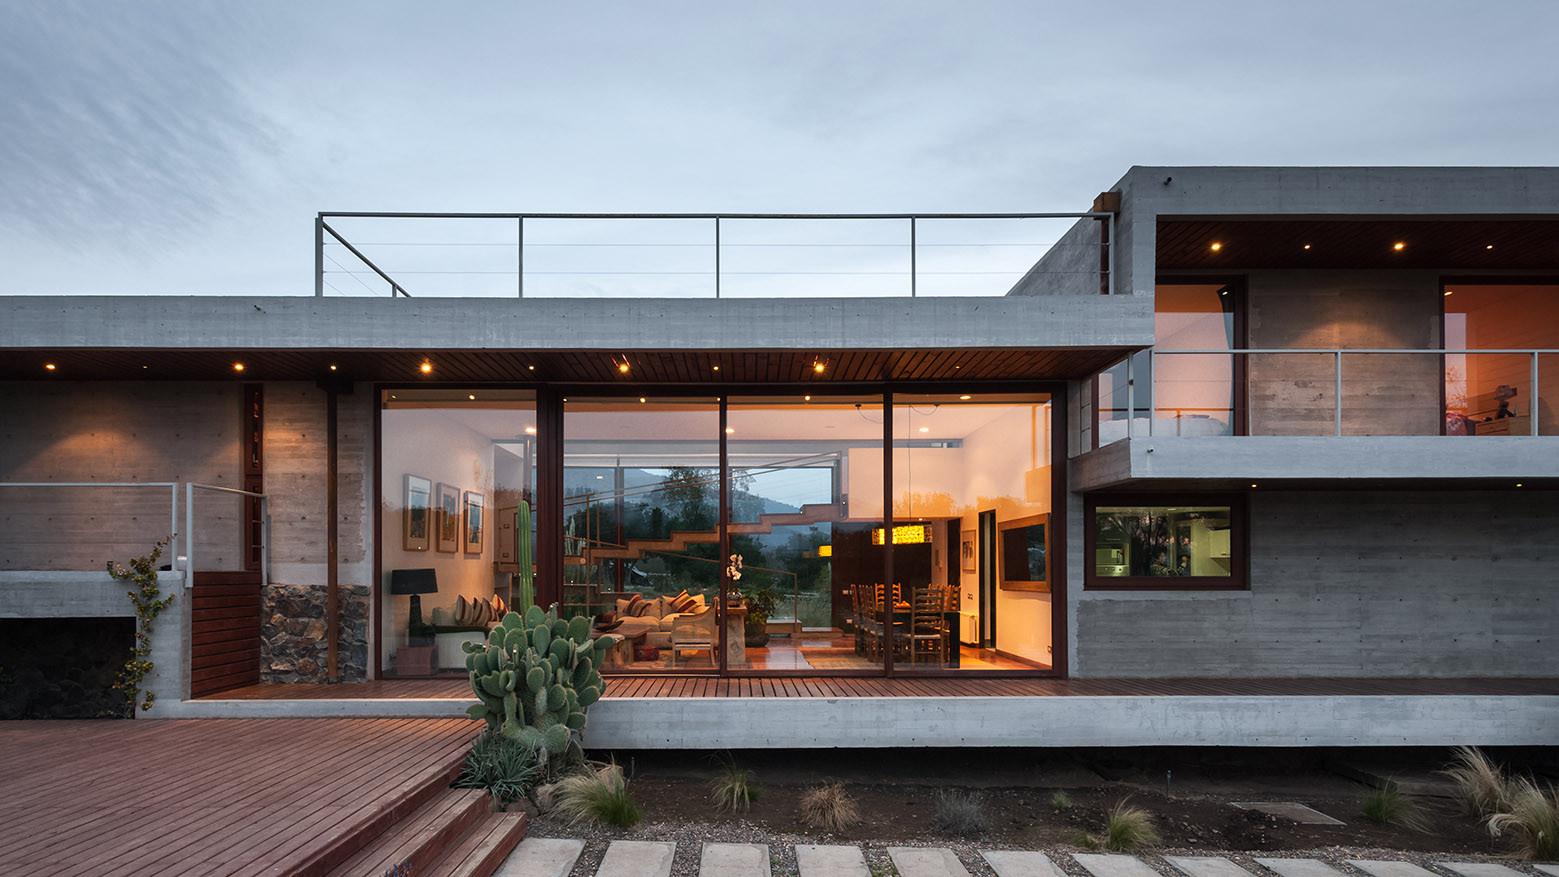 Gallery of corredor house chauriye st ger arquitectos 11 for Casa minimalista una planta